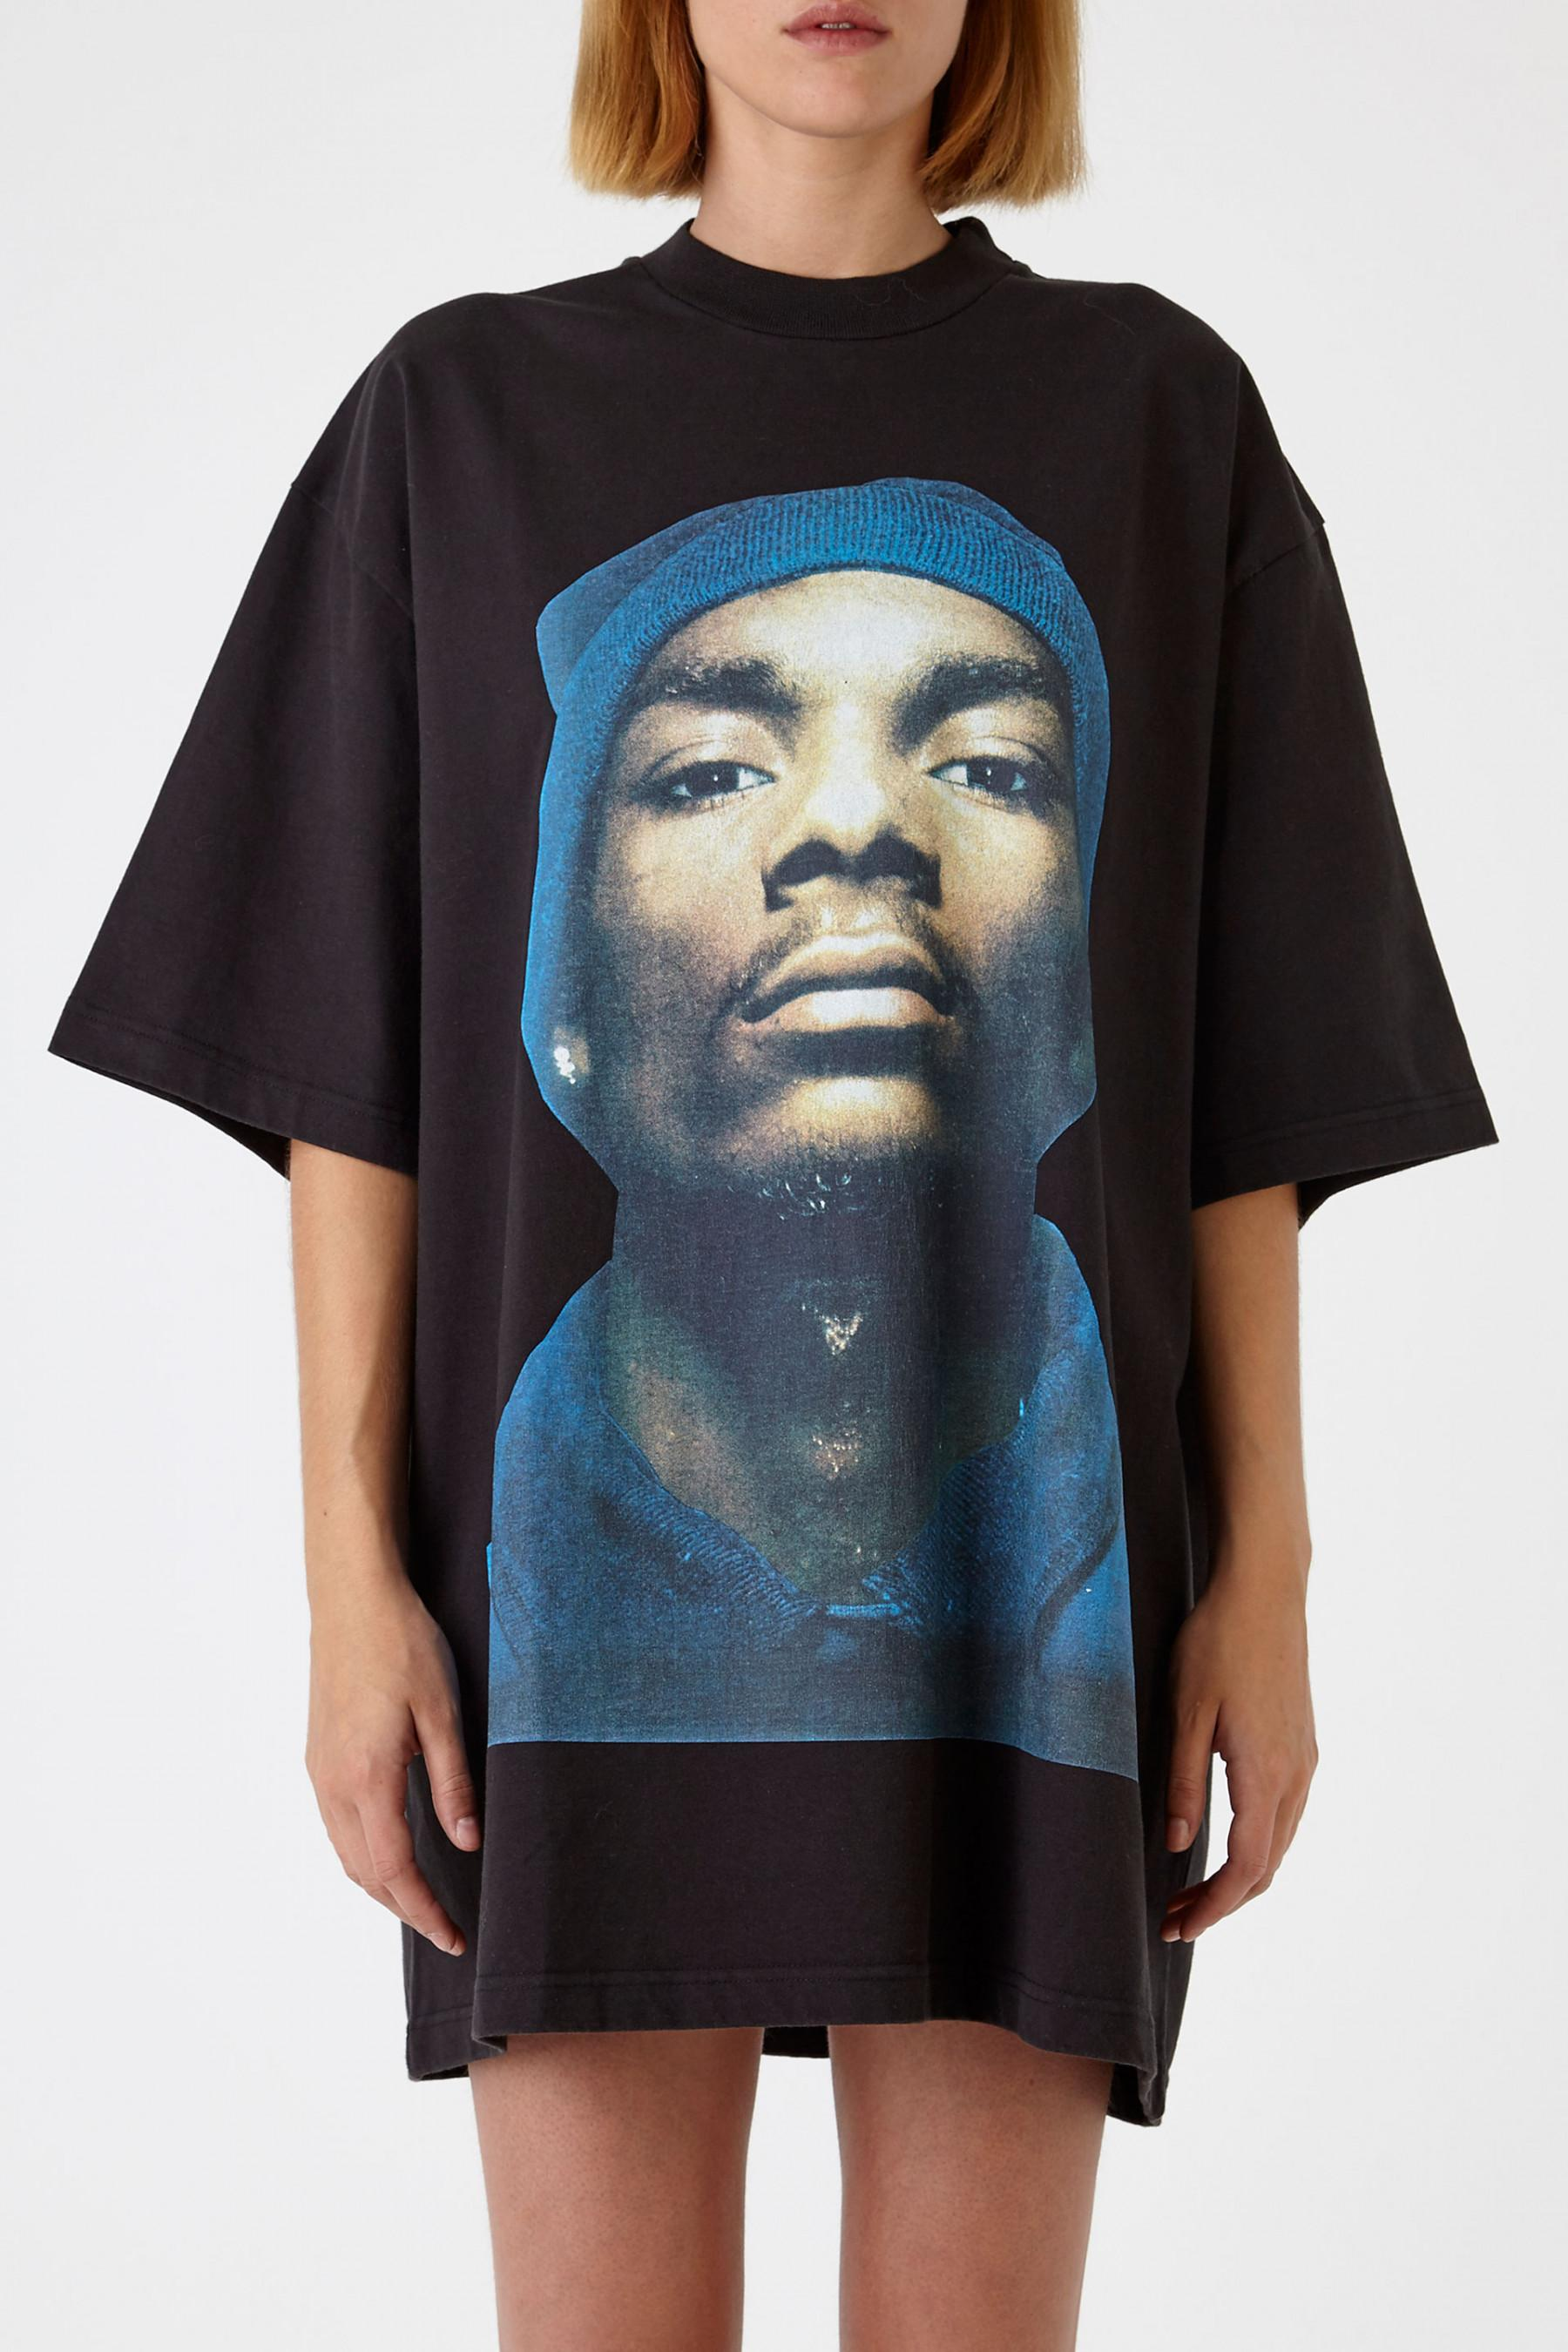 c8c53edc Vetements Snoop Dogg Oversized T-Shirt in Black - Lyst